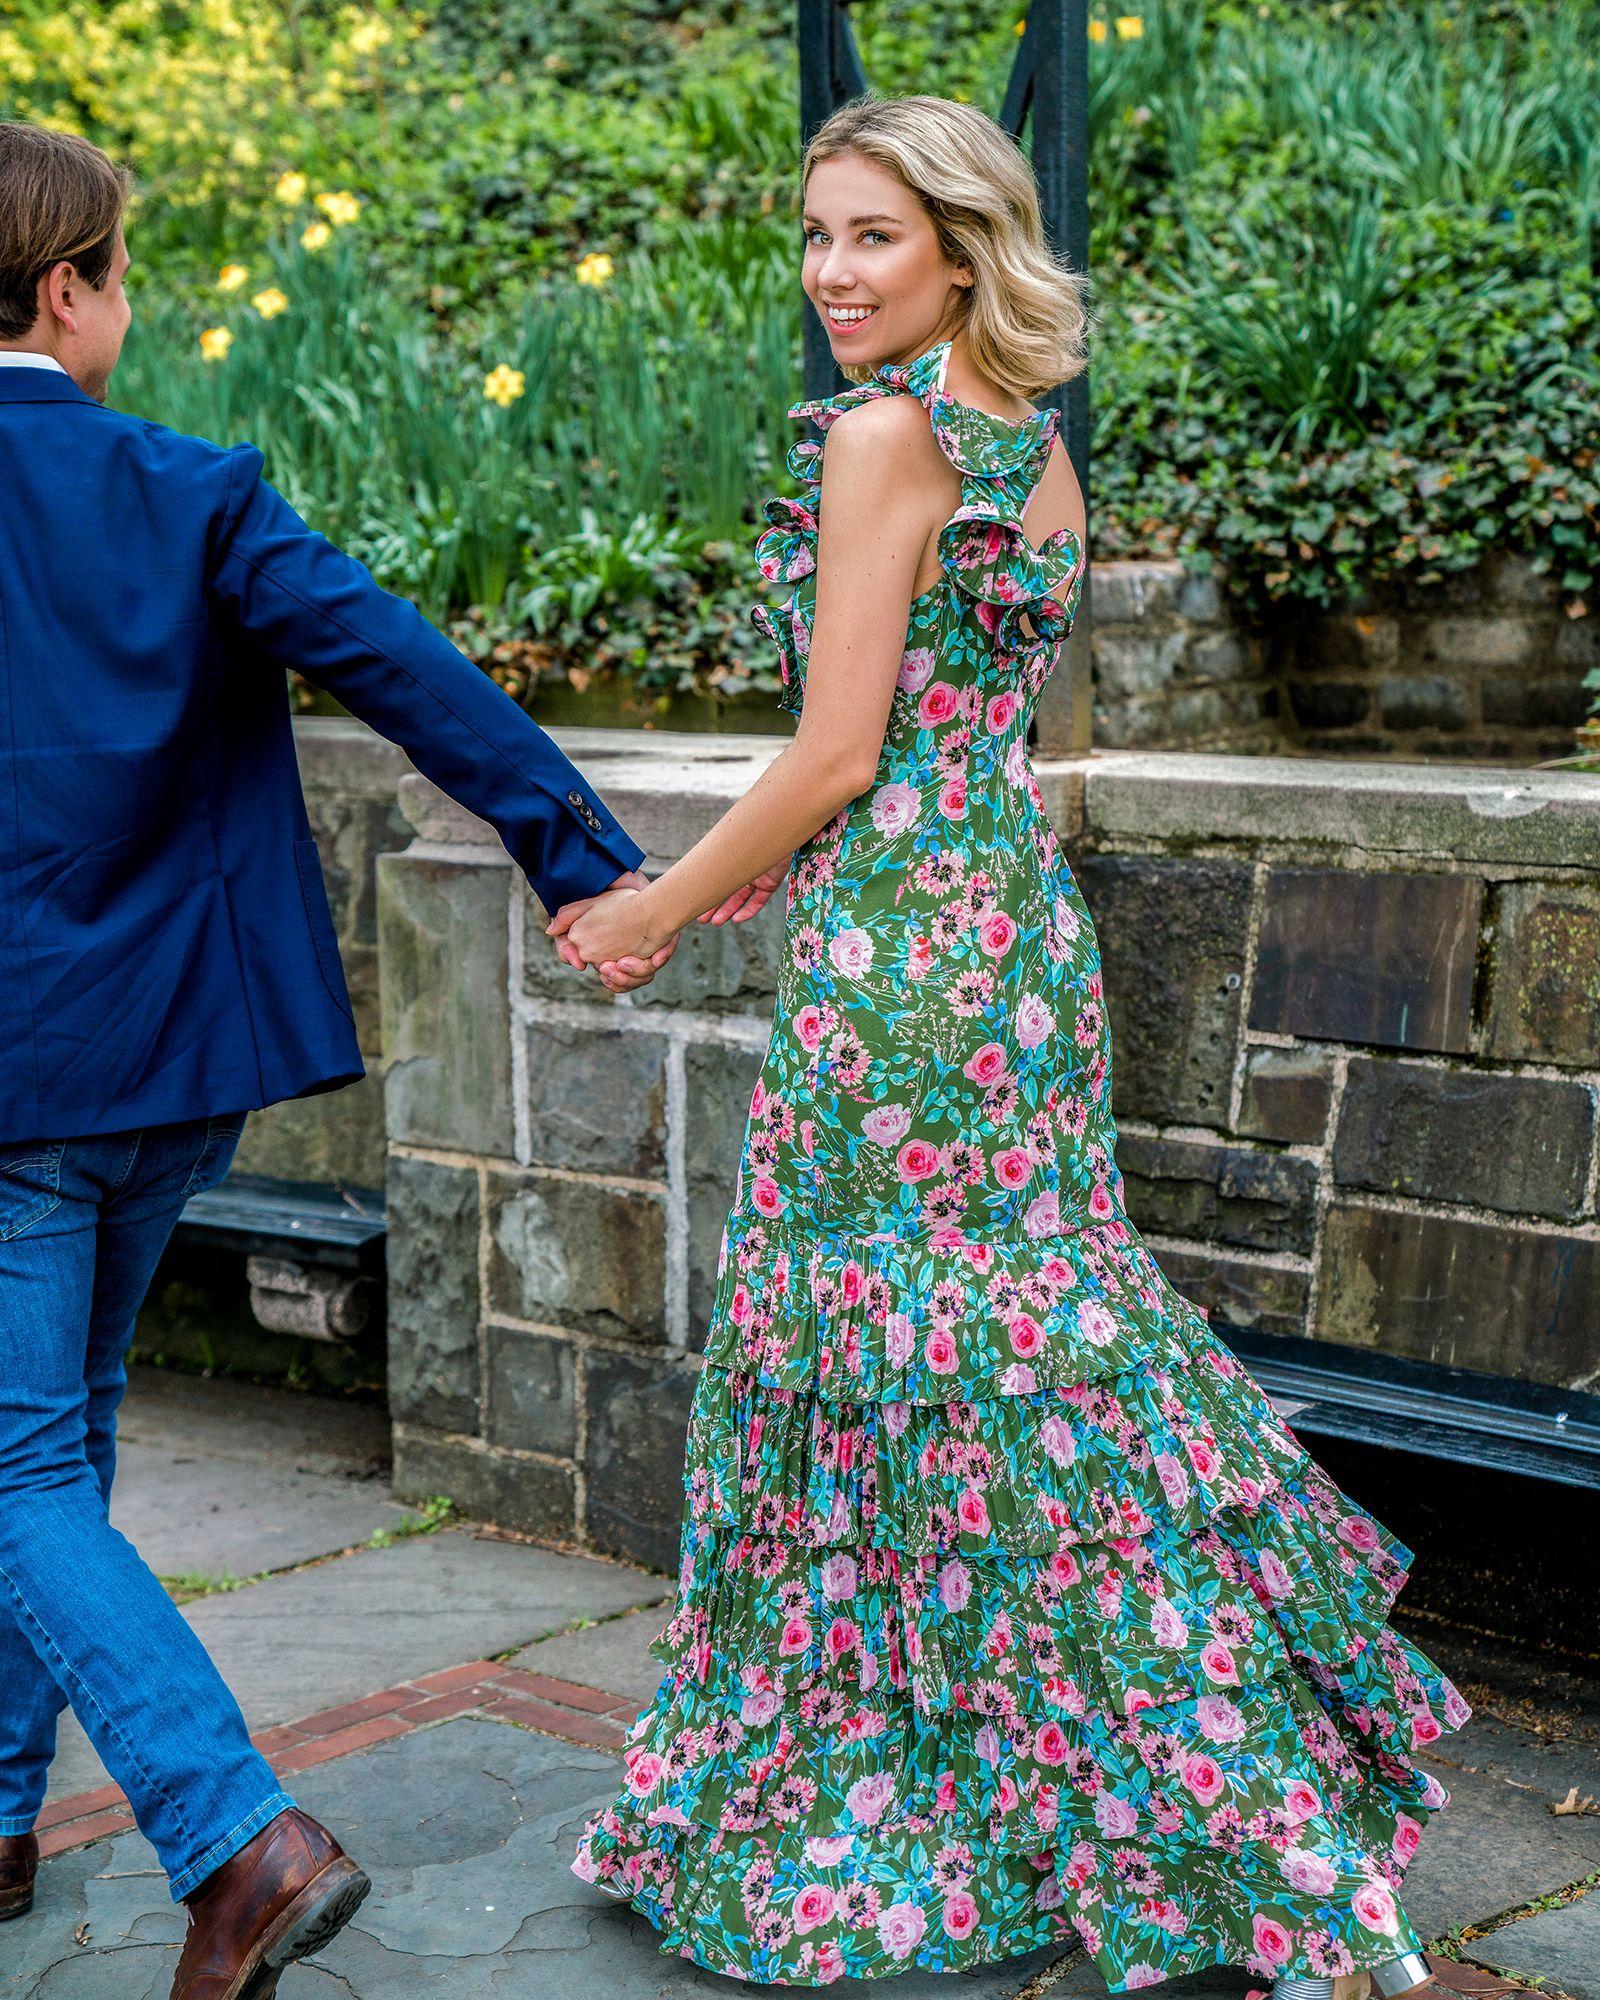 14 Most Classy Wedding Guest Dresses Ever Vera Casagrande Classy Wedding Guest Dresses Wedding Guest Dress Summer Wedding Guest Dress [ 2000 x 1600 Pixel ]